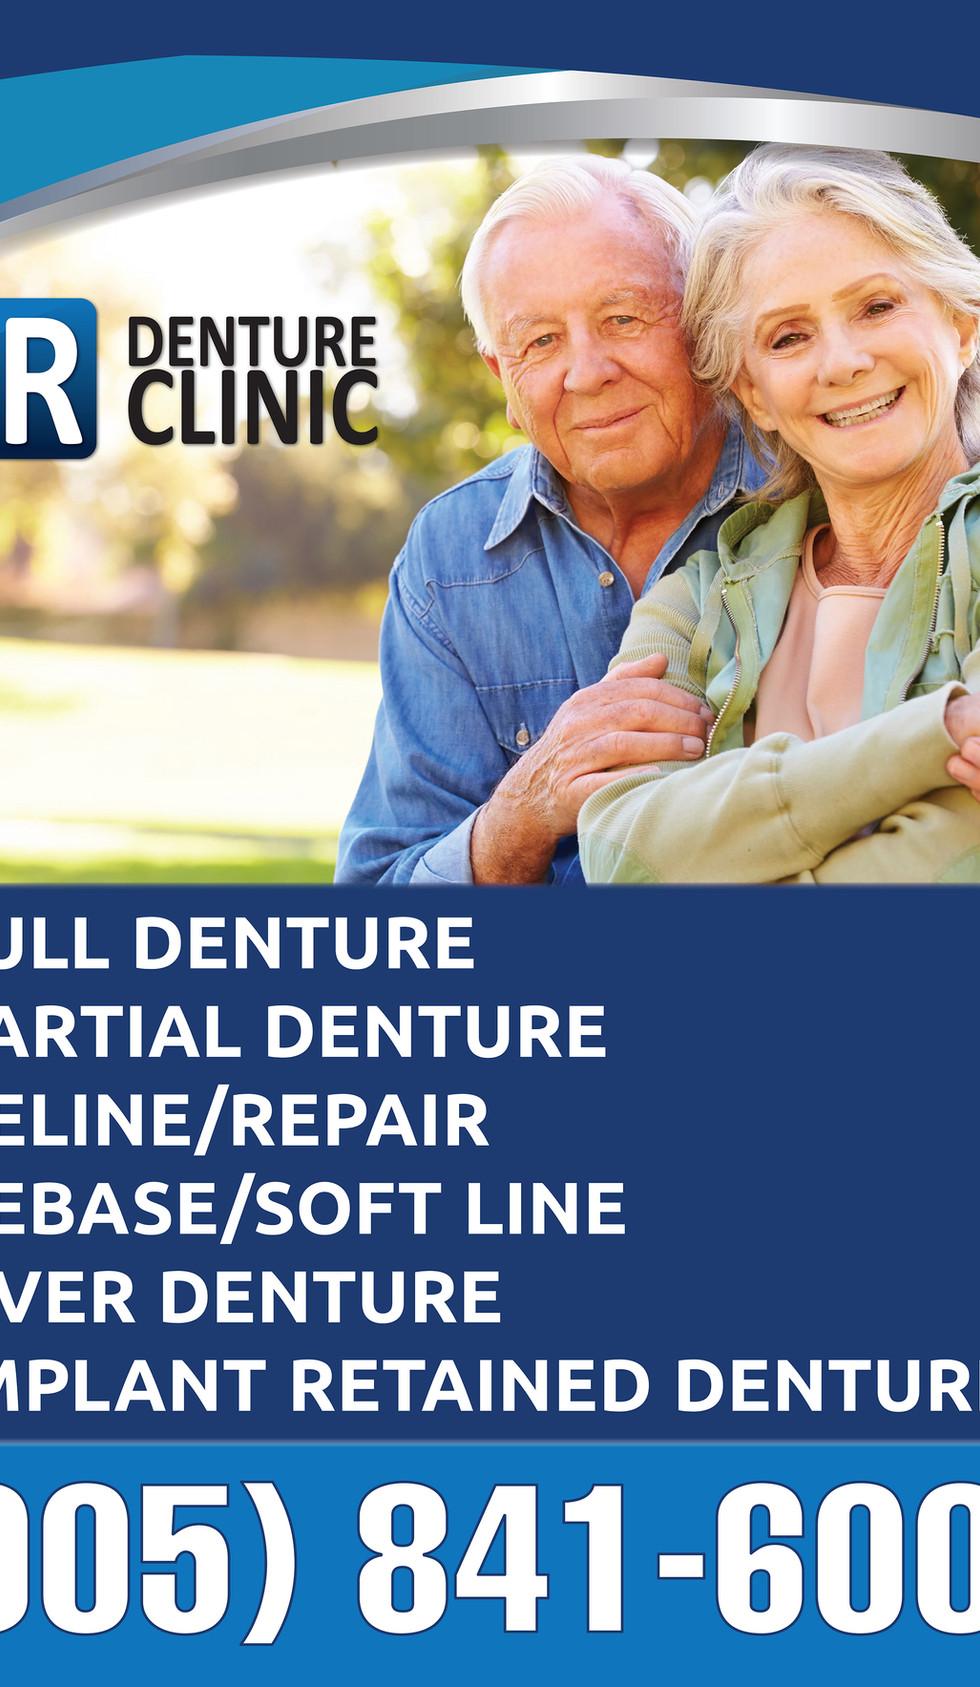 HR Dental Clinic_WindowGraphic_May 2018_